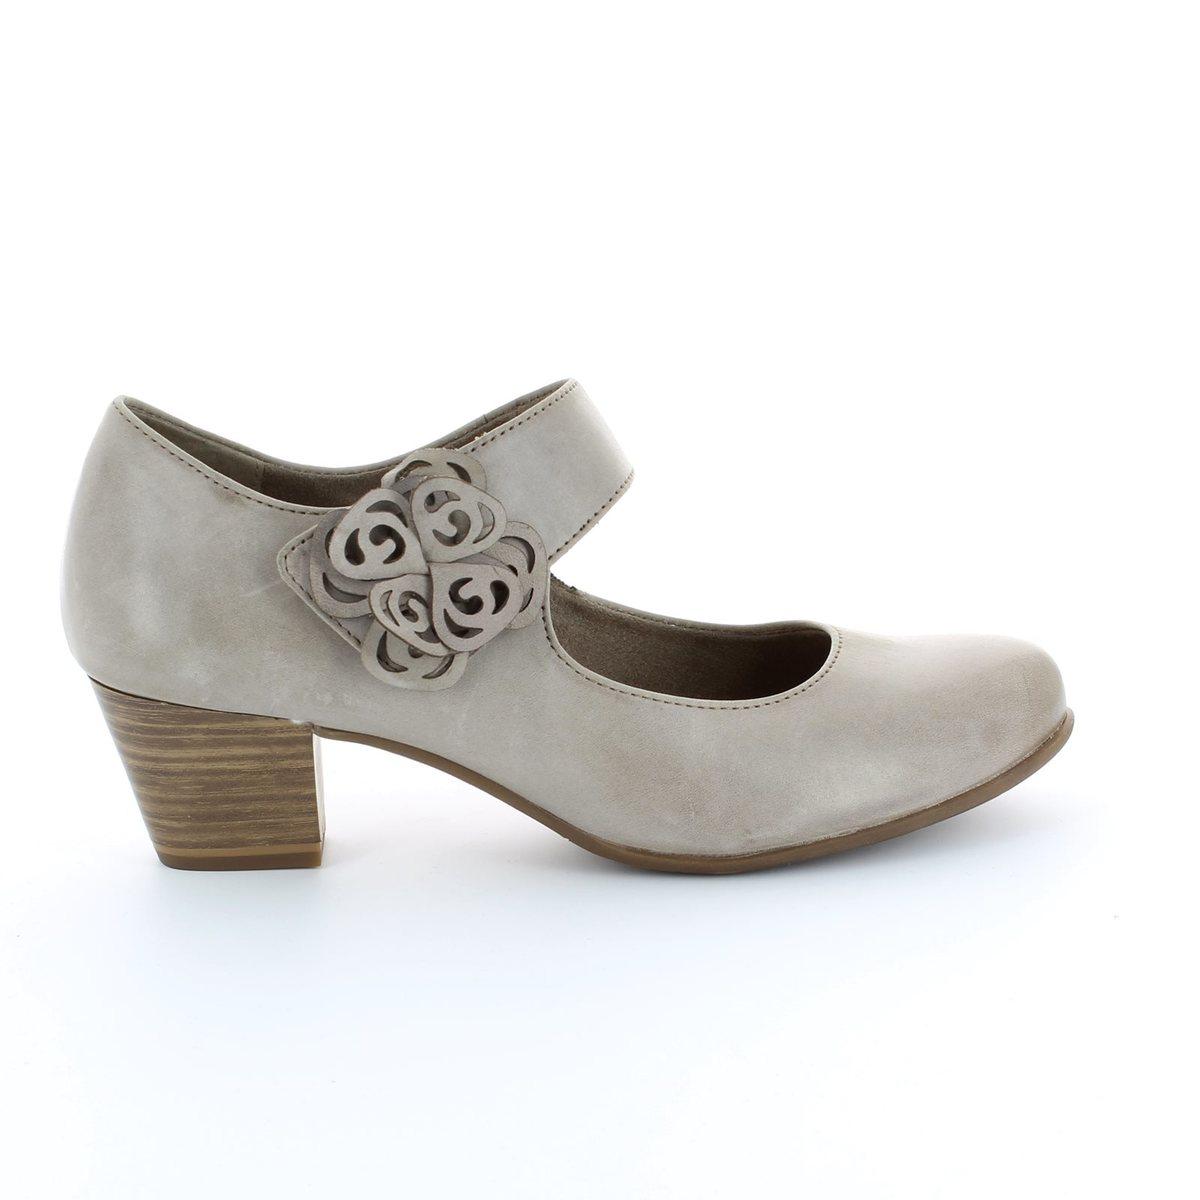 tamaris 24410 324 taupe heeled shoes. Black Bedroom Furniture Sets. Home Design Ideas